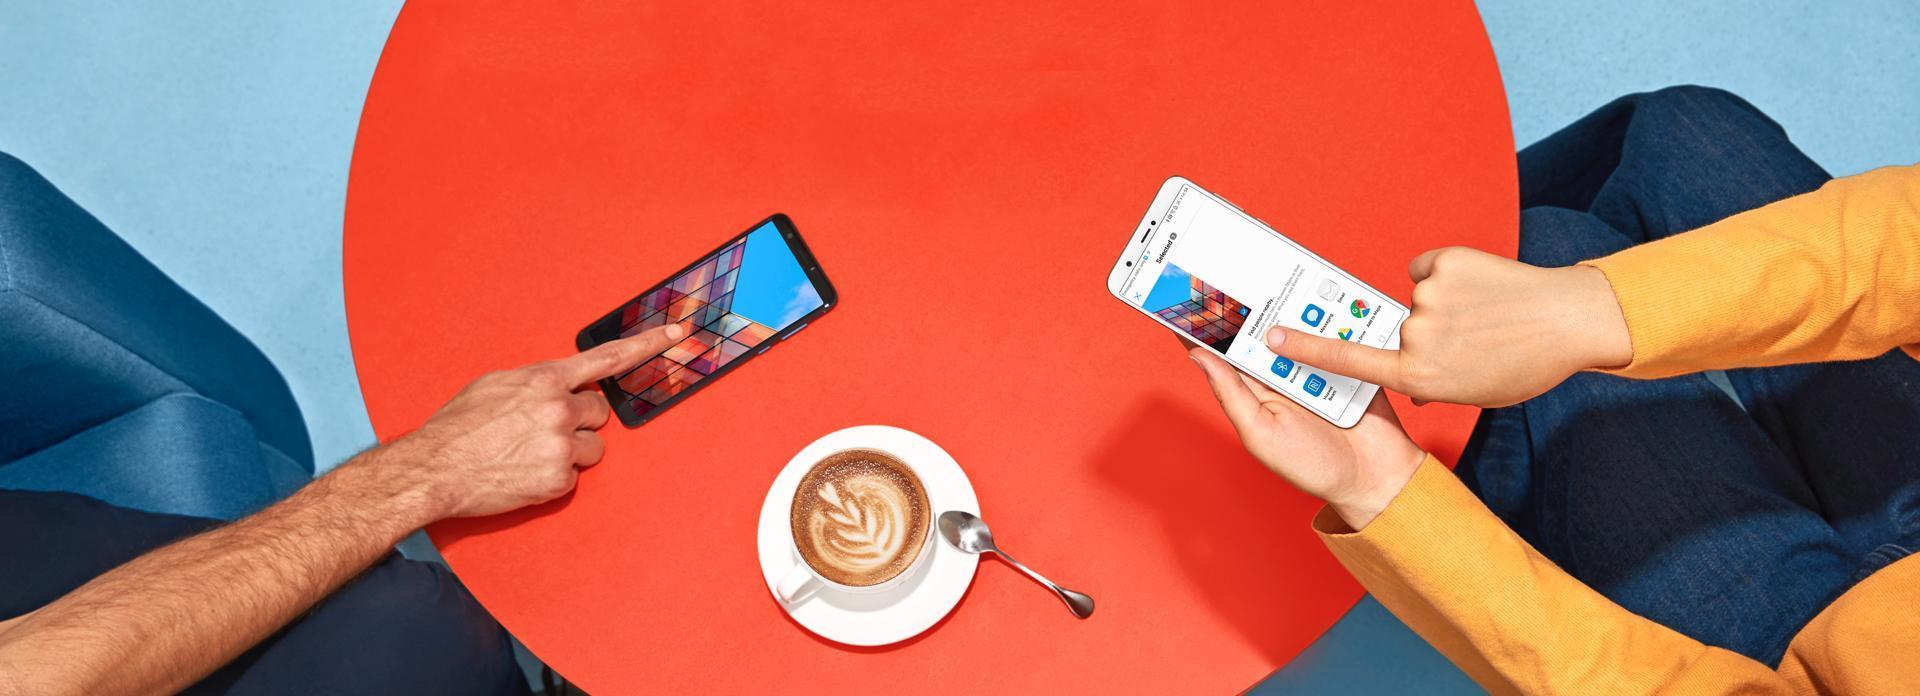 https://consumer-img.huawei.com/content/dam/huawei-cbg-site/common/mkt/pdp/phones/p-smart/img/huawei-share/huawei-p-smart-huawei-share-bg-original.jpg